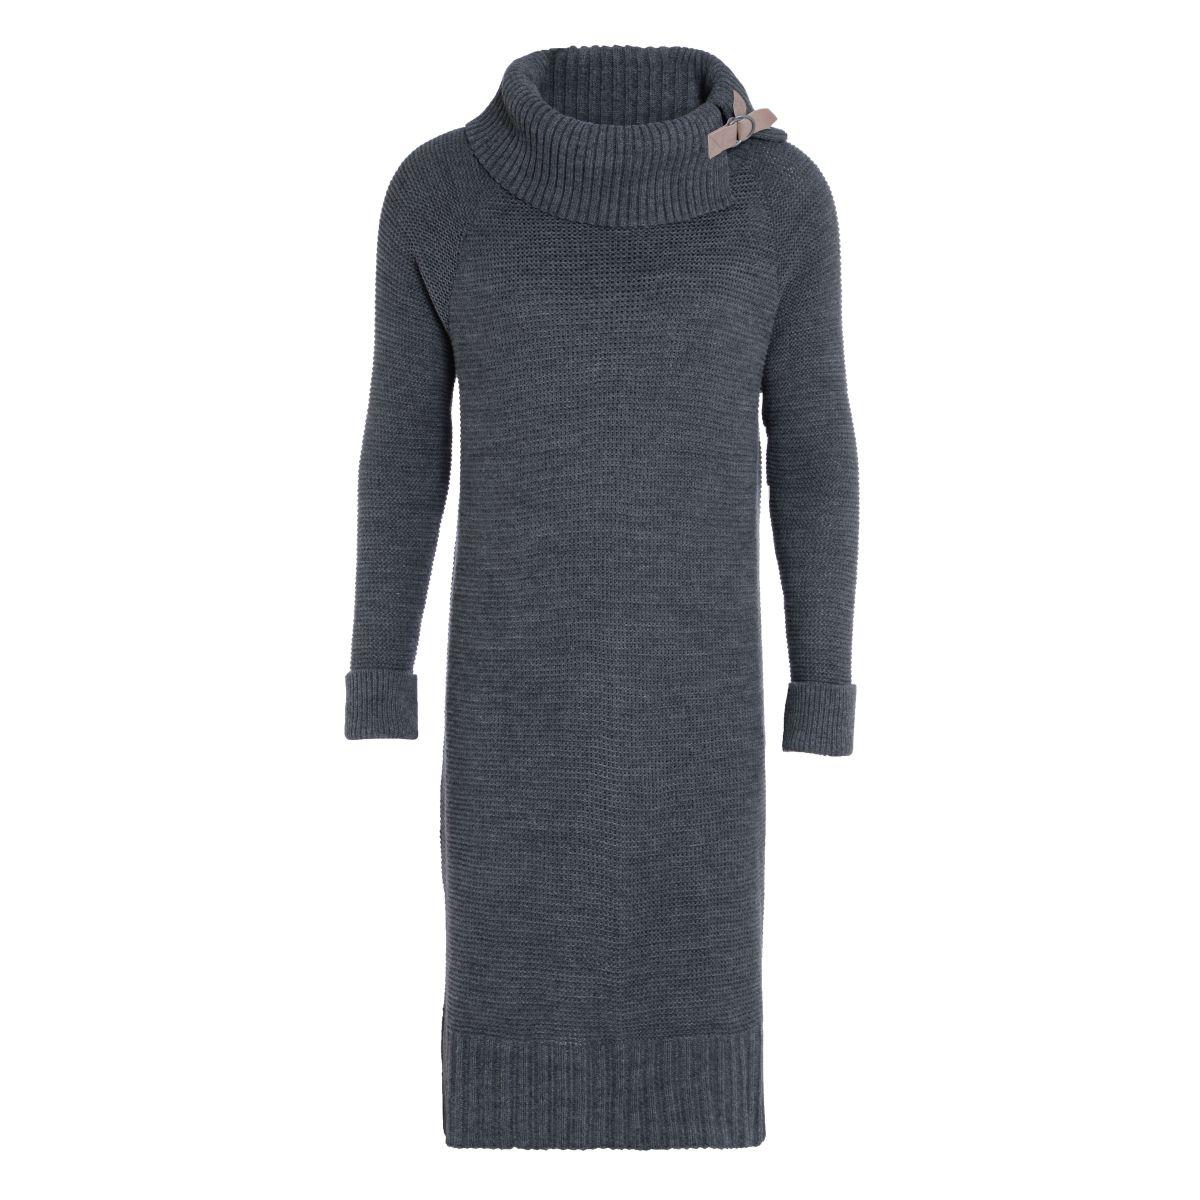 jamie gebreide jurk antraciet 3638